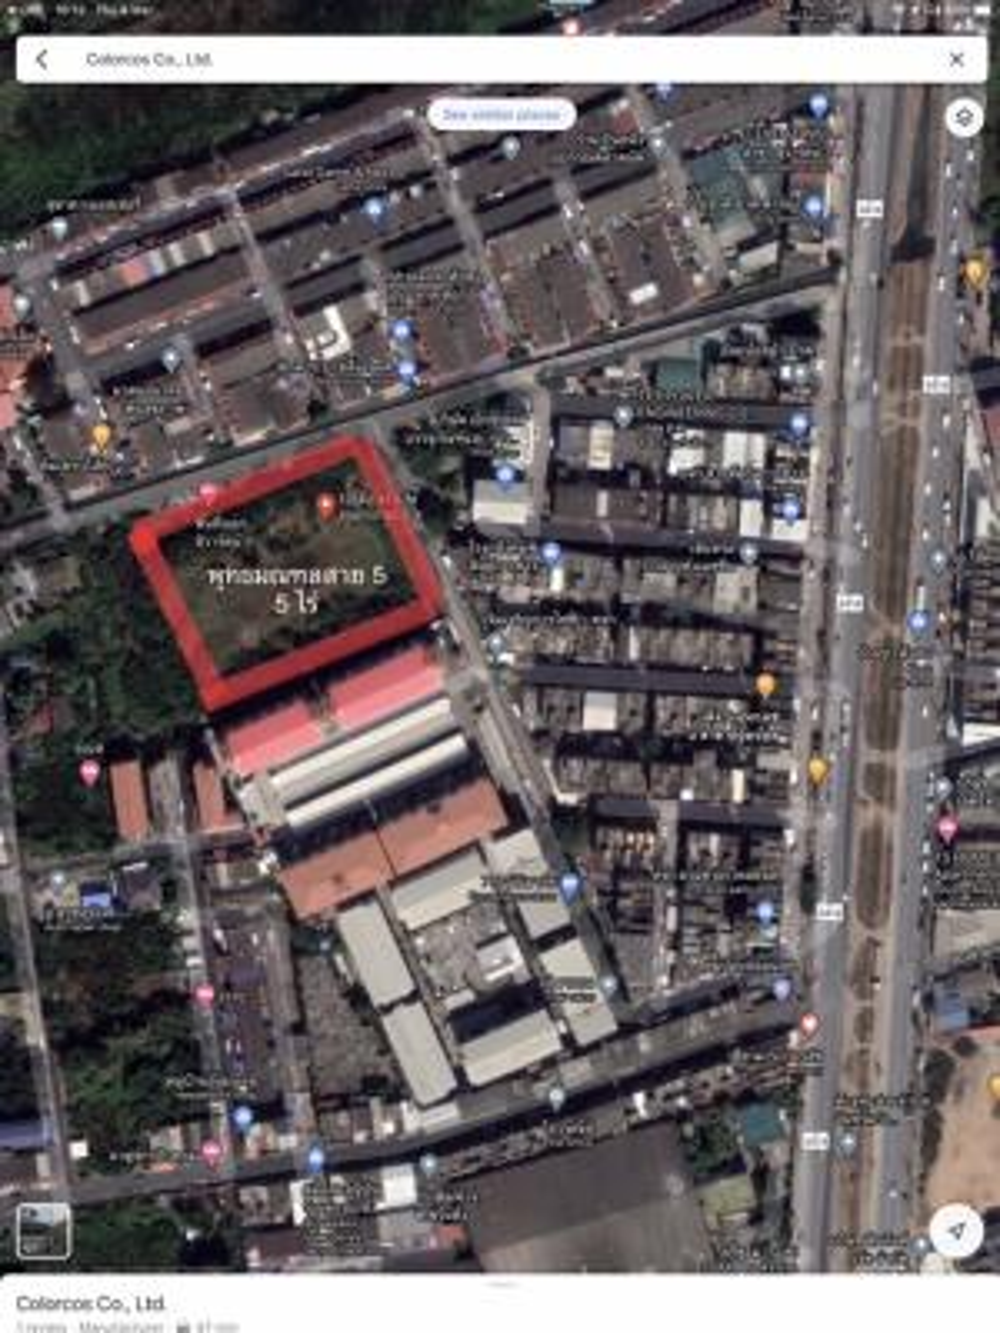 For SaleLandMahachai Samut Sakhon : Land for sale 5 rai 18 square wa, Om Noi Subdistrict, Krathum Baen District, Samut Sakhon Province (filled)Location: Om Noi Subdistrict, Krathum Baen District, Samut Sakhon Province